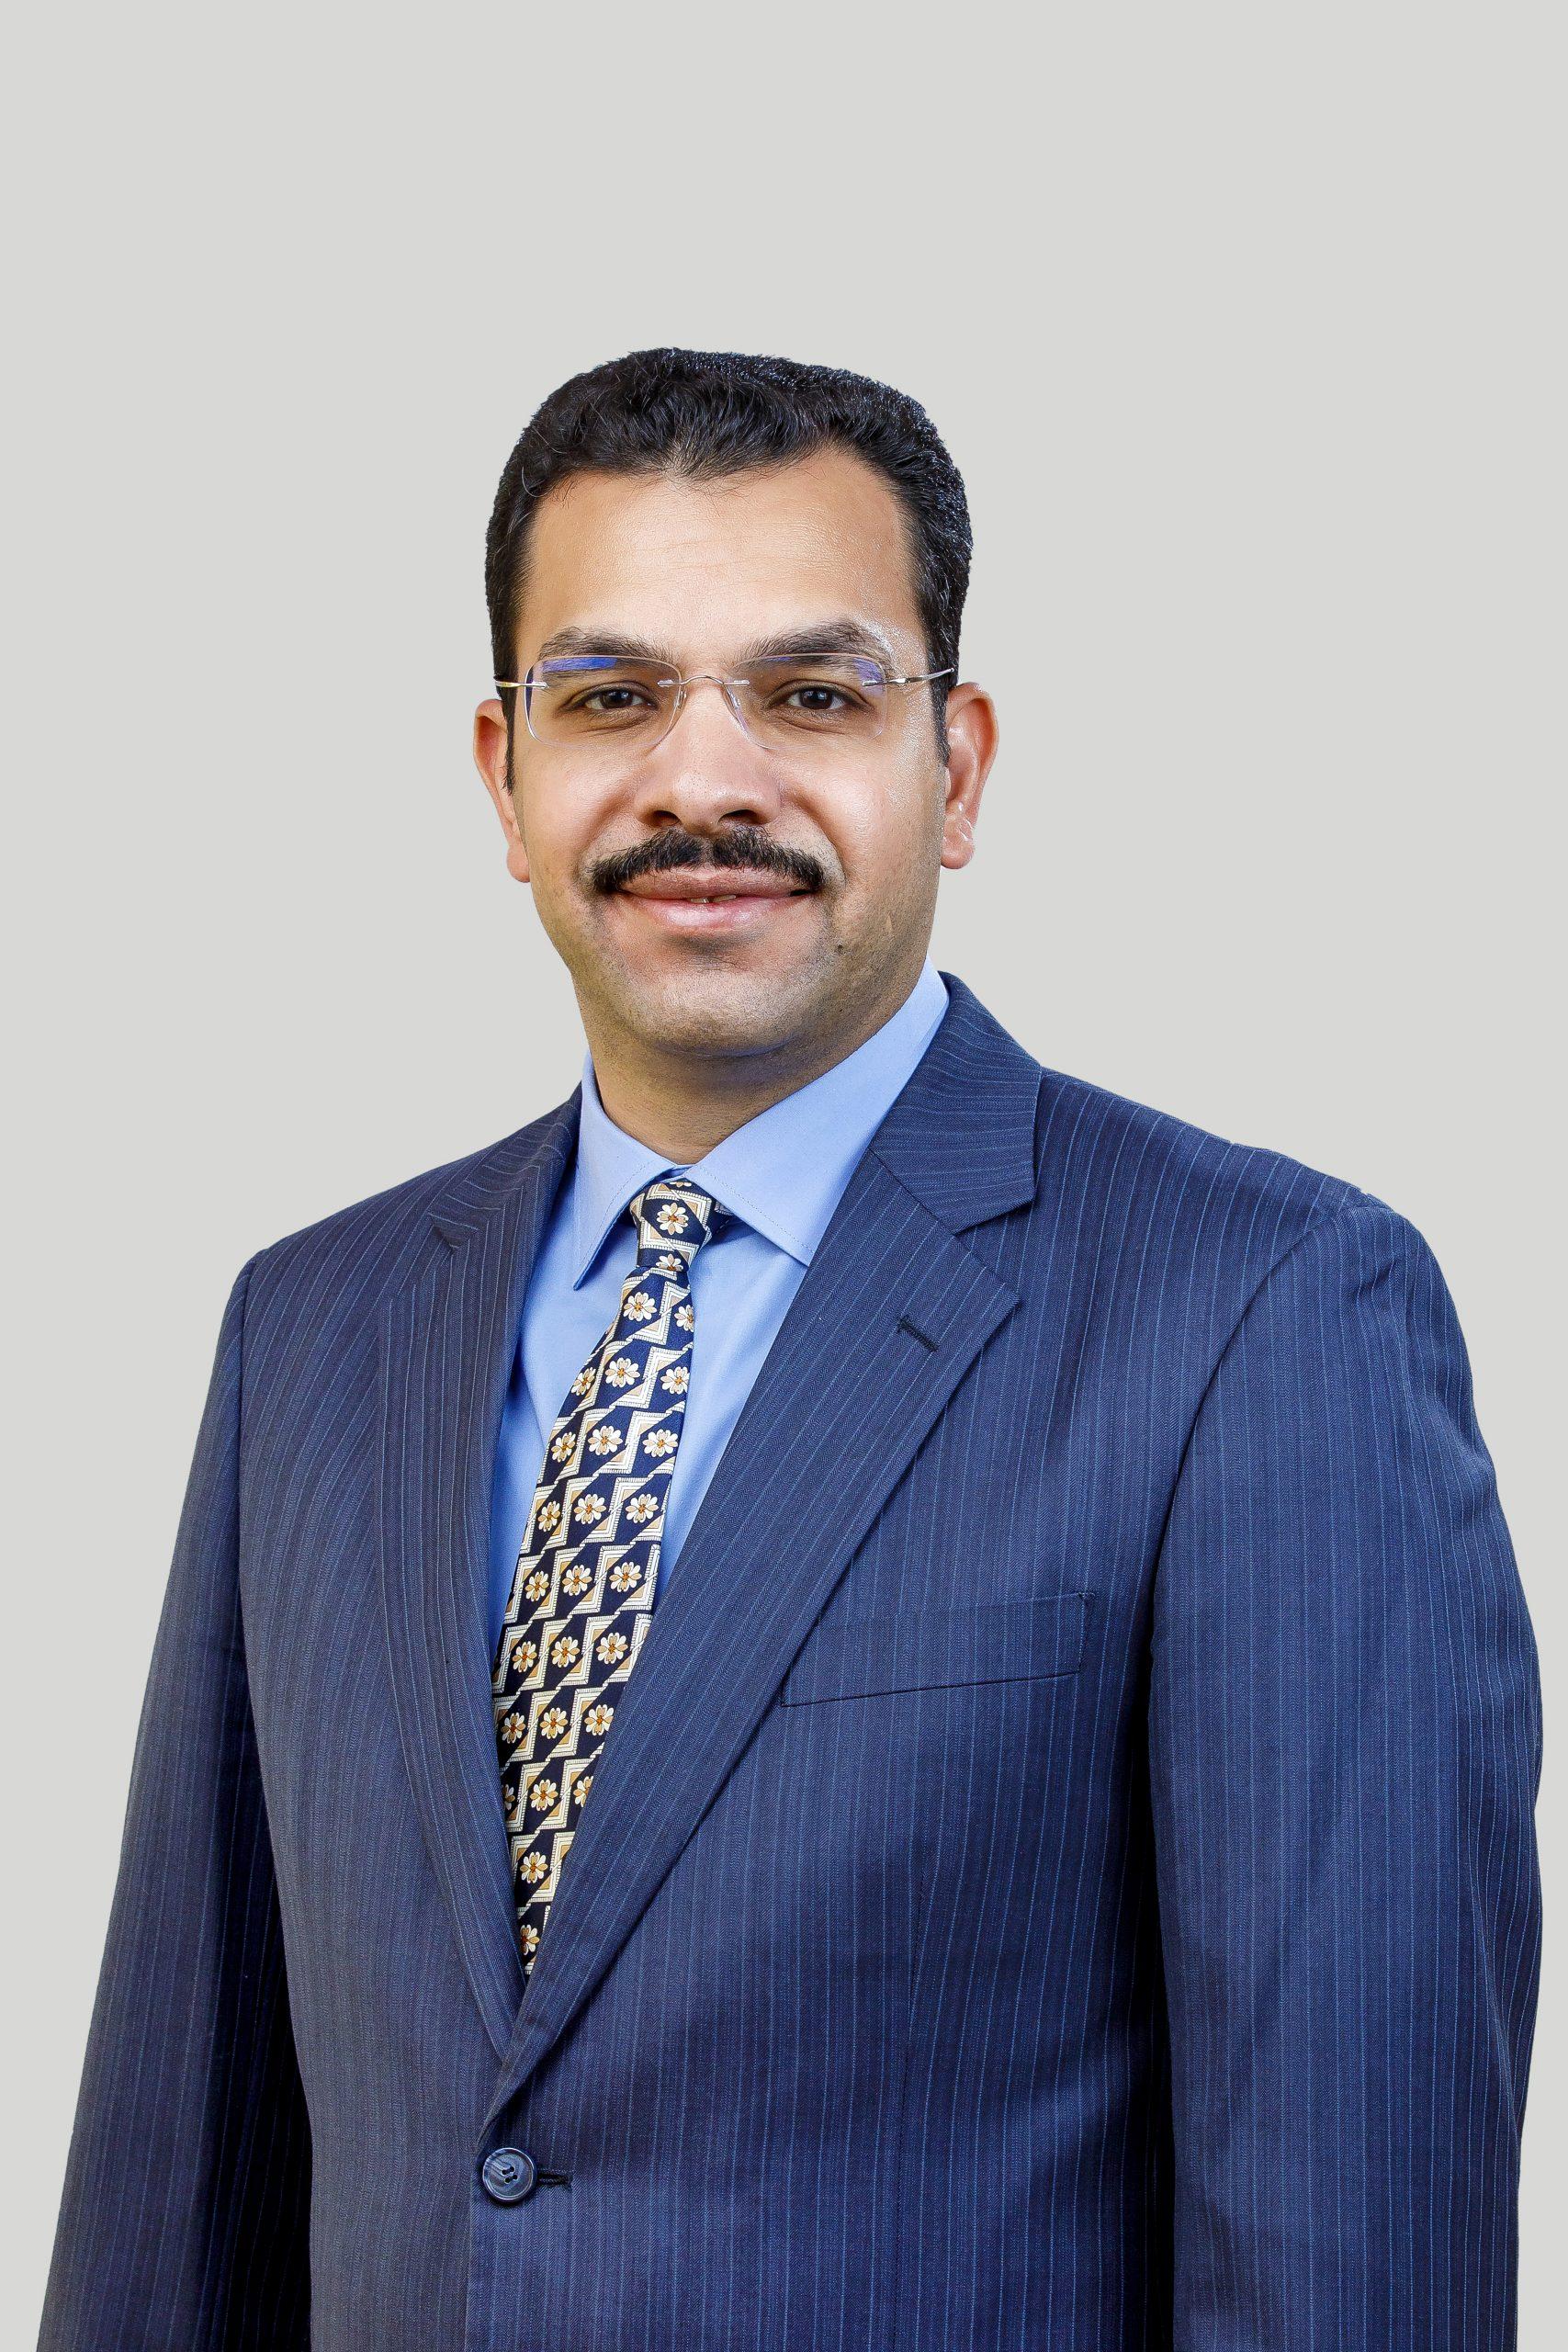 Lecturer Bassam El Khateeb